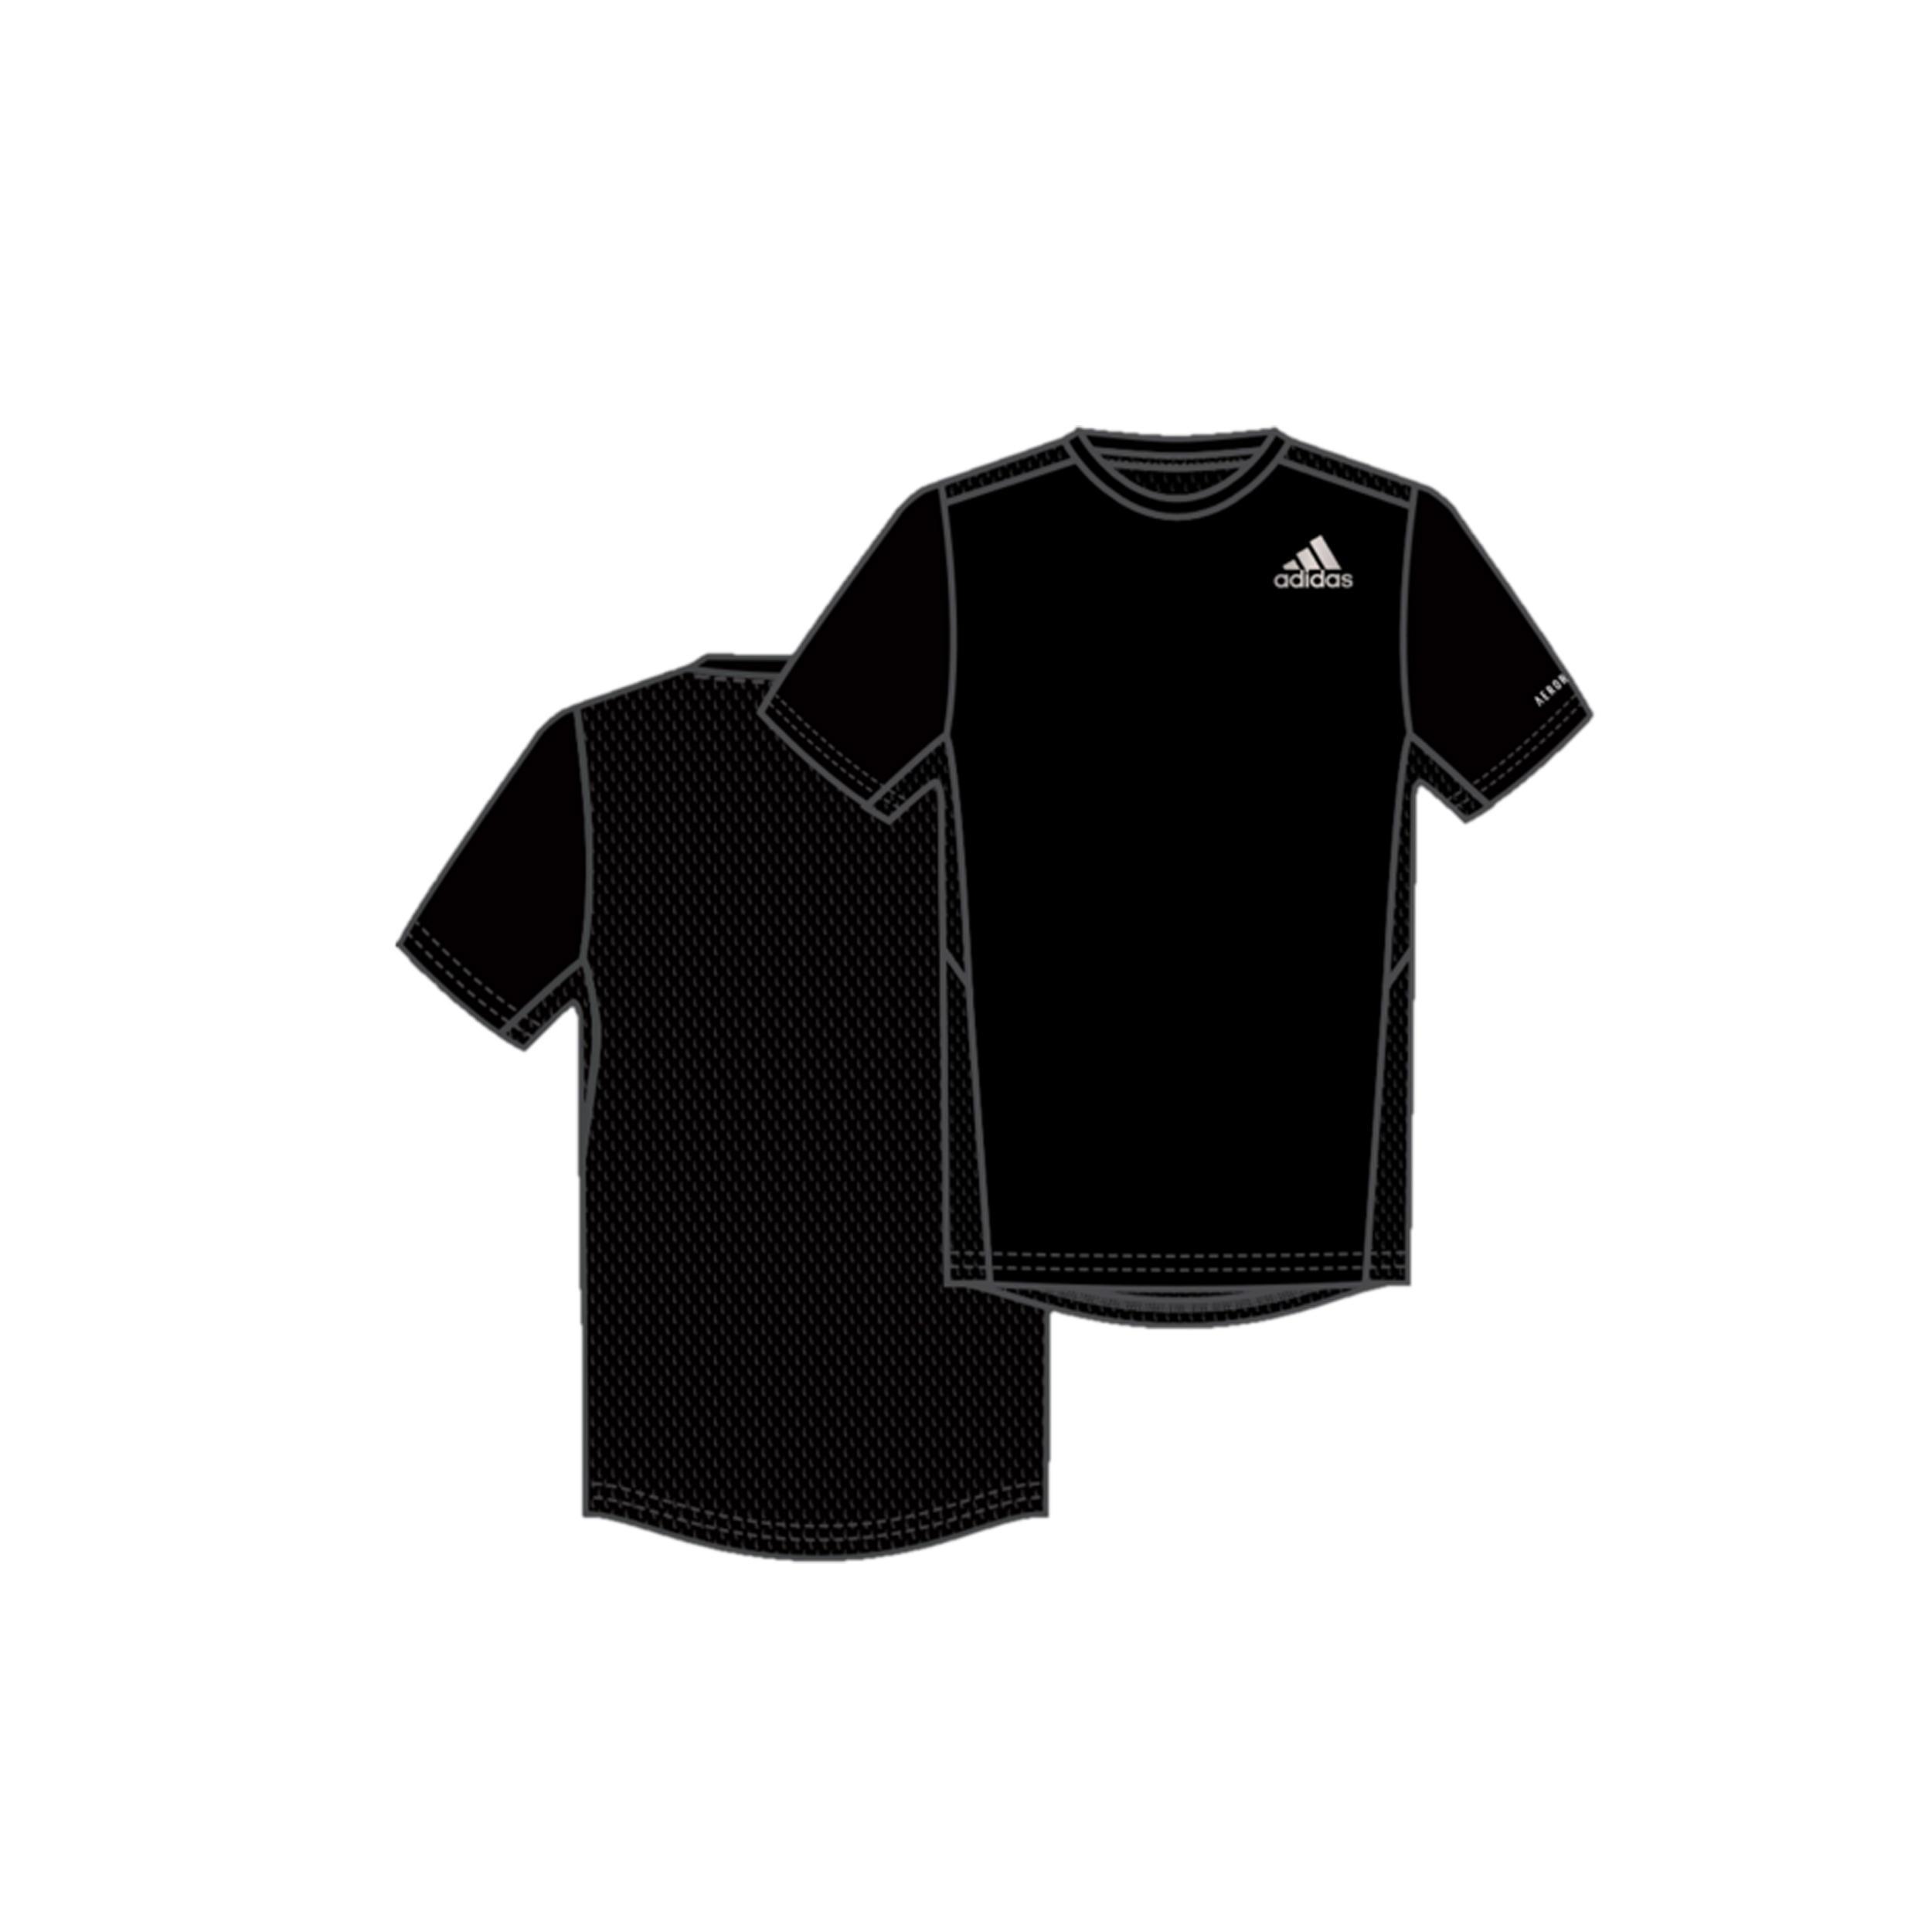 Estación Encommium científico  Camiseta manga corta Adidas Douario hombre negro ADIDAS | Decathlon